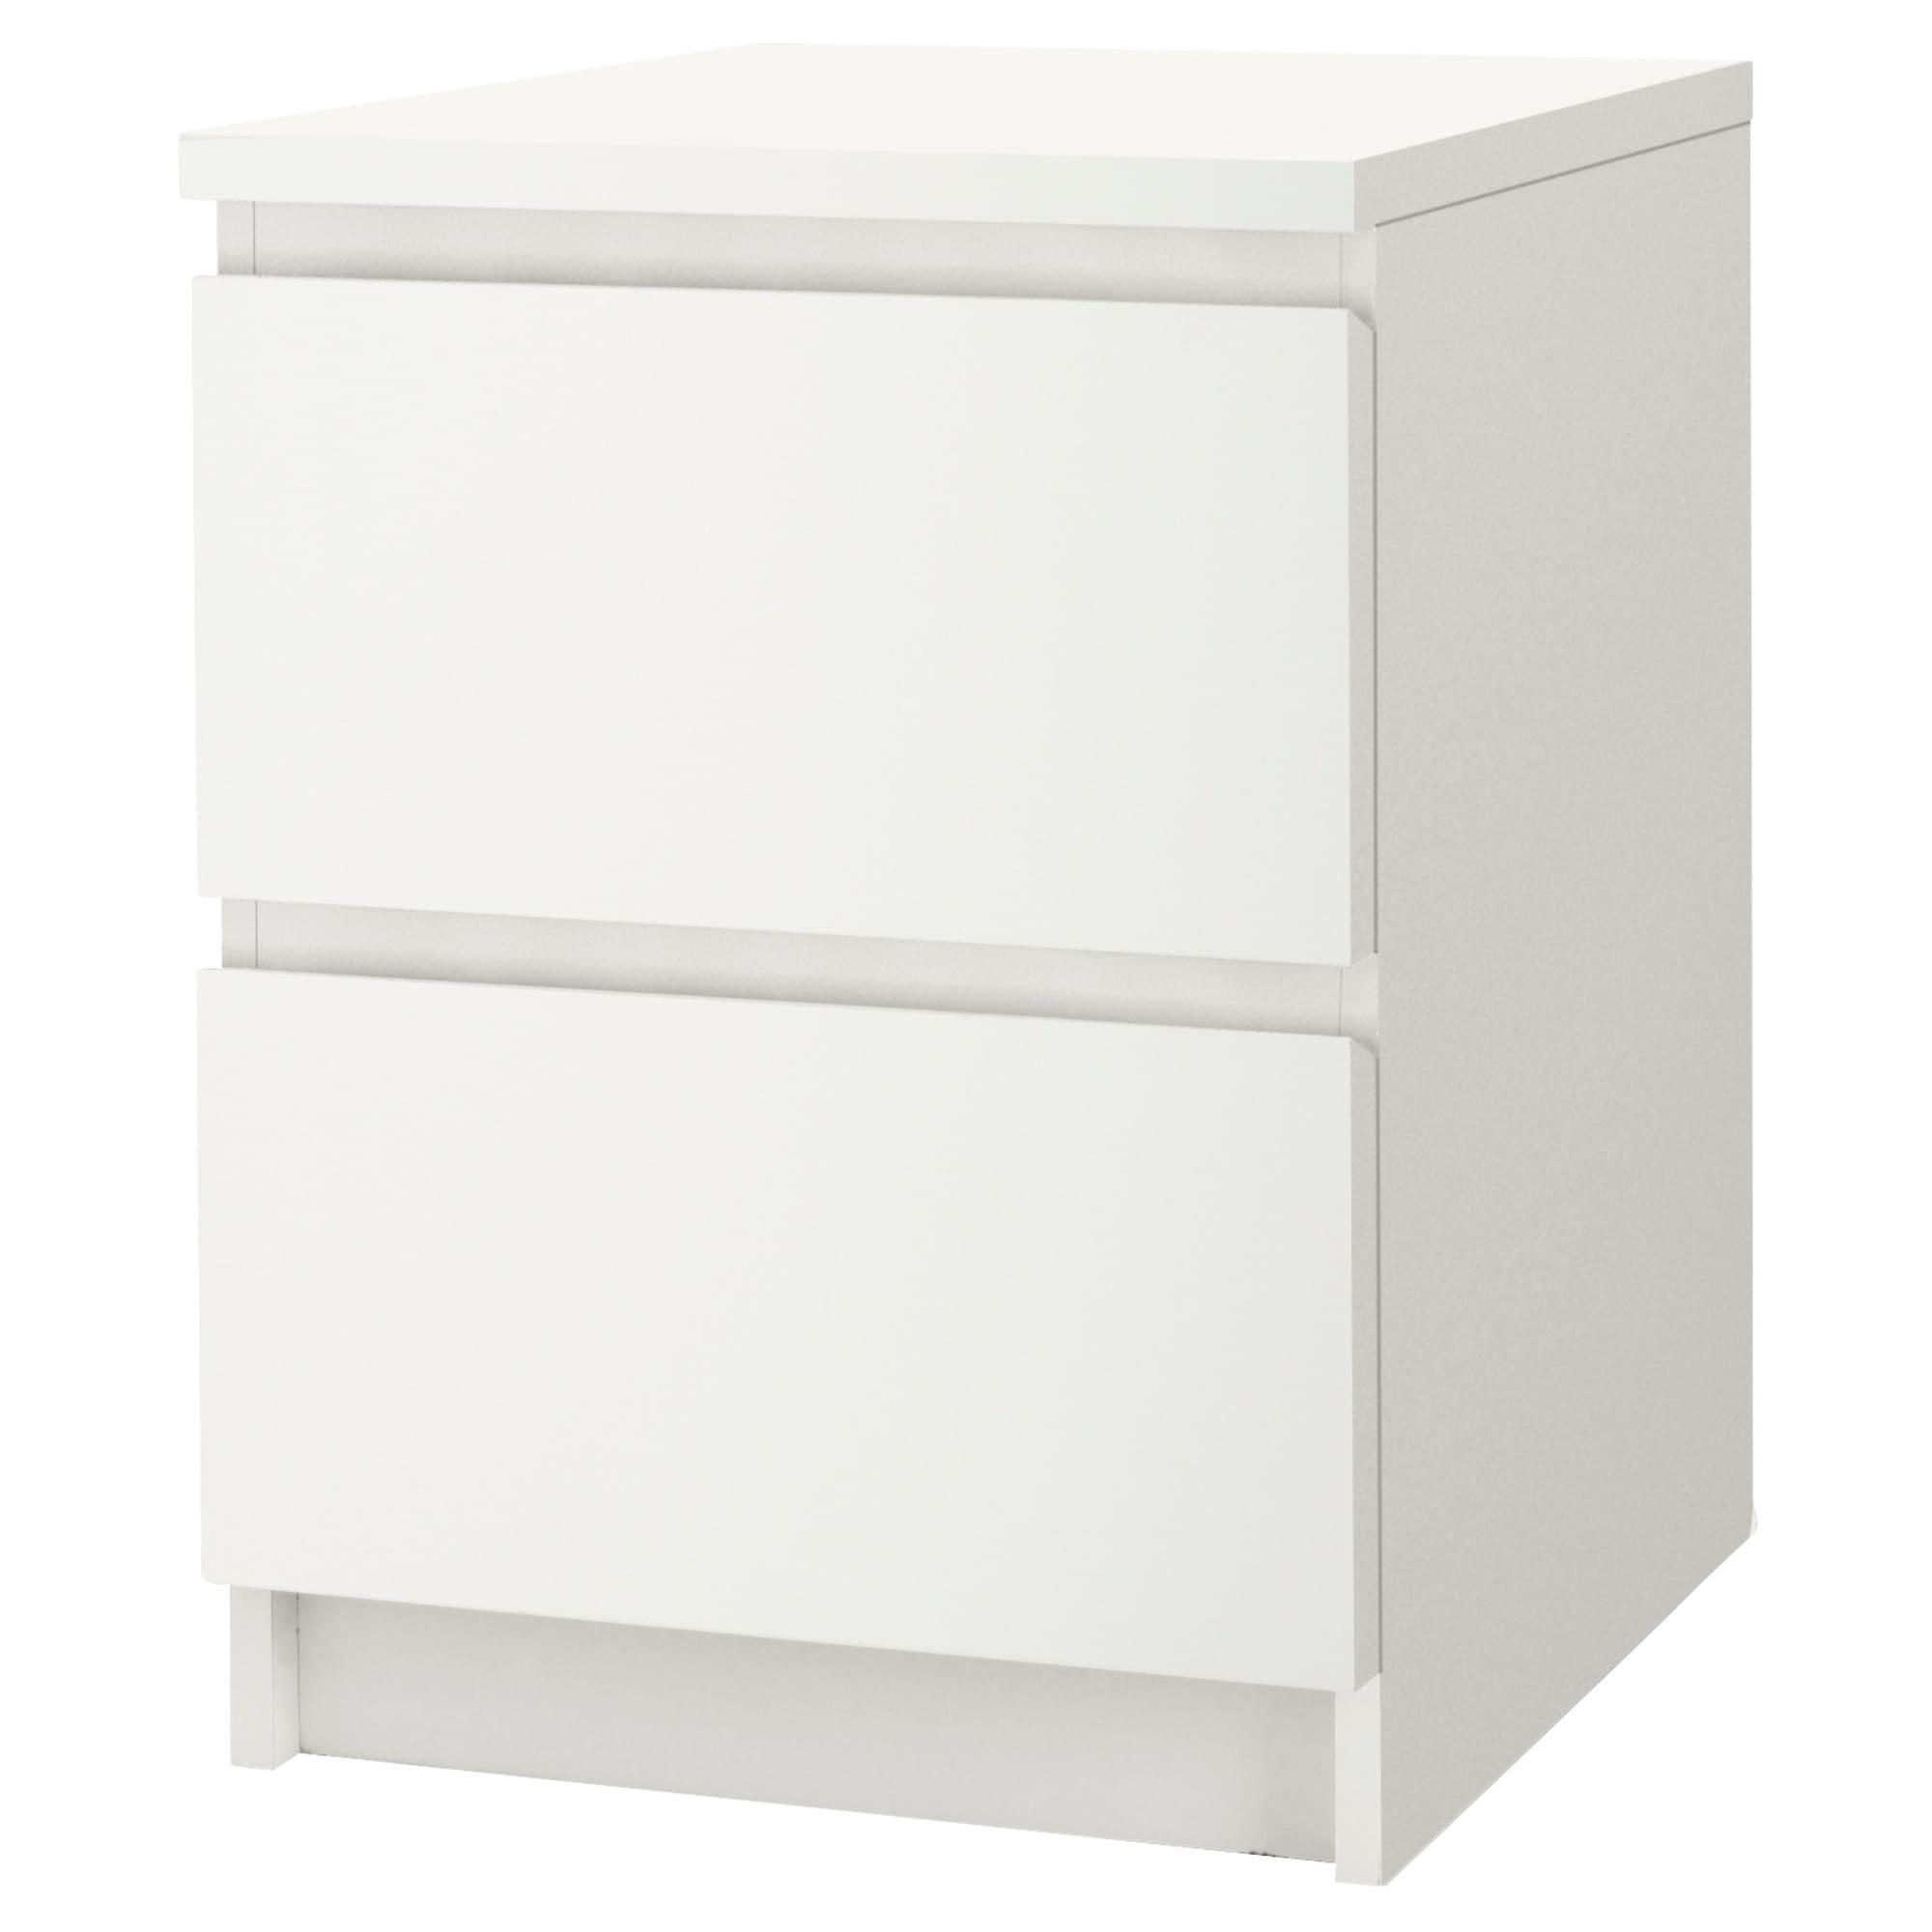 ikea - malm 2-drawer chest white | pinterest | malm, ikea malm and